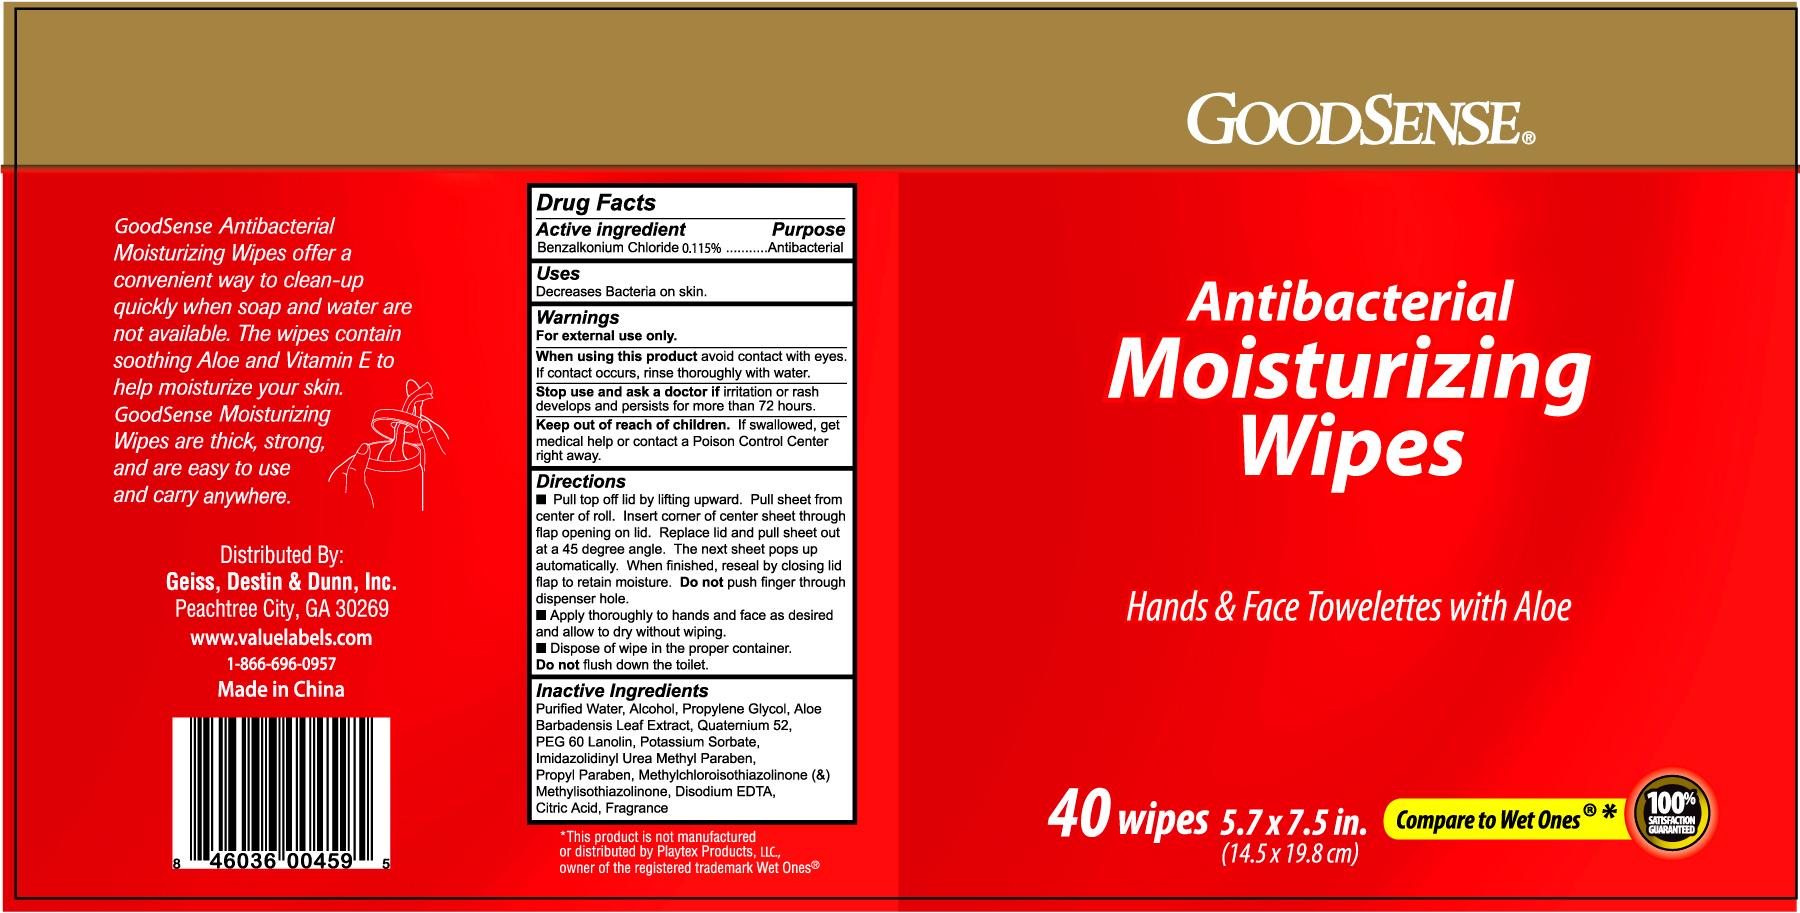 Goodsense Antibacterial Moisturizing (Benzalkonium Chloride) Film [Geiss, Destin And Dunn, Inc.]